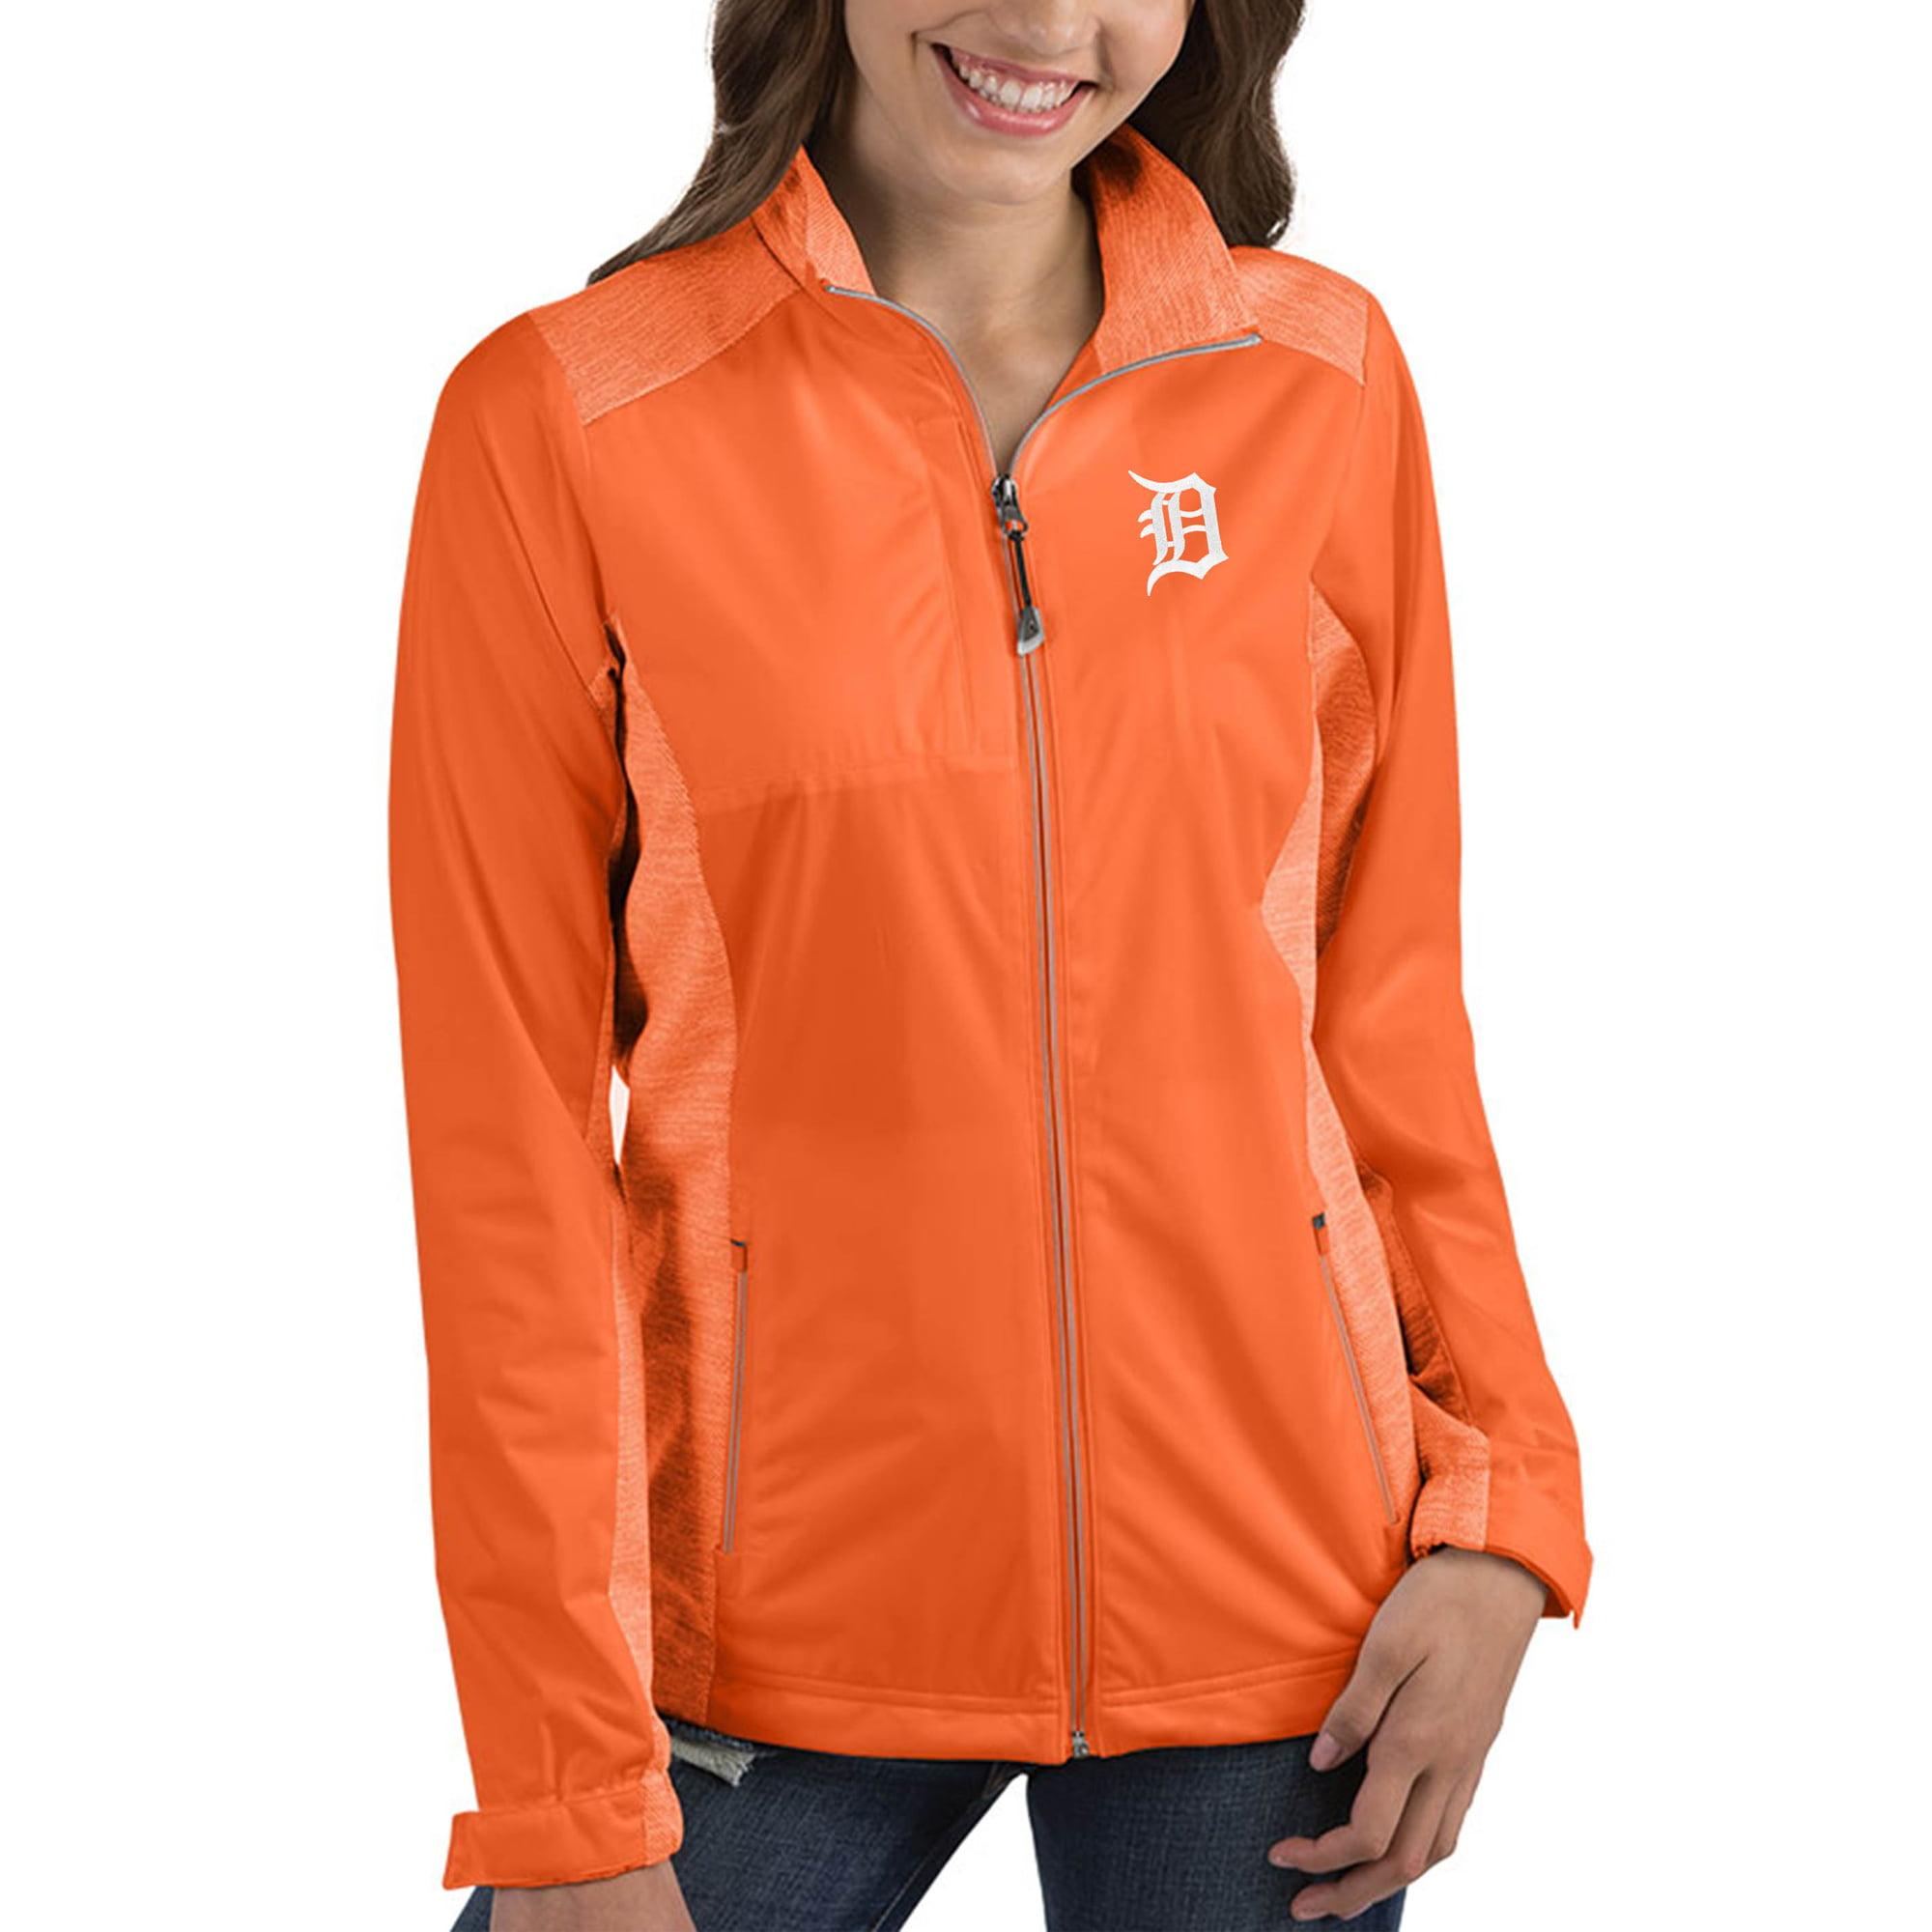 Detroit Tigers Antigua Women's Revolve Full-Zip Jacket - Orange